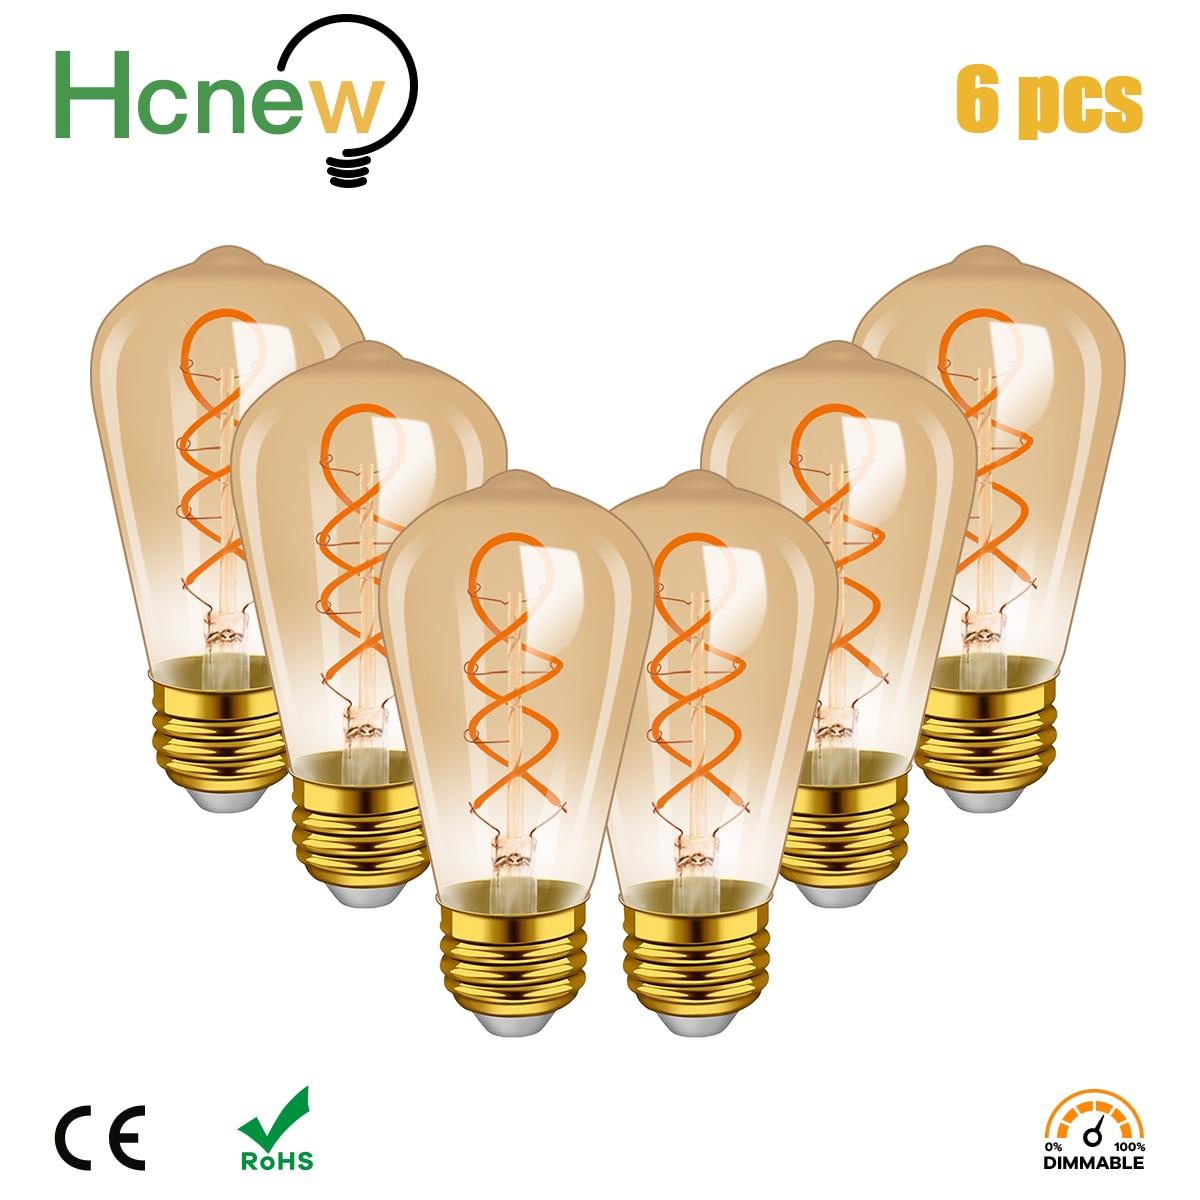 Светодиодная винтажная лампа Эдисона в стиле ретро, 6 шт./лот, E27, 220 В, 4 Вт, ST64